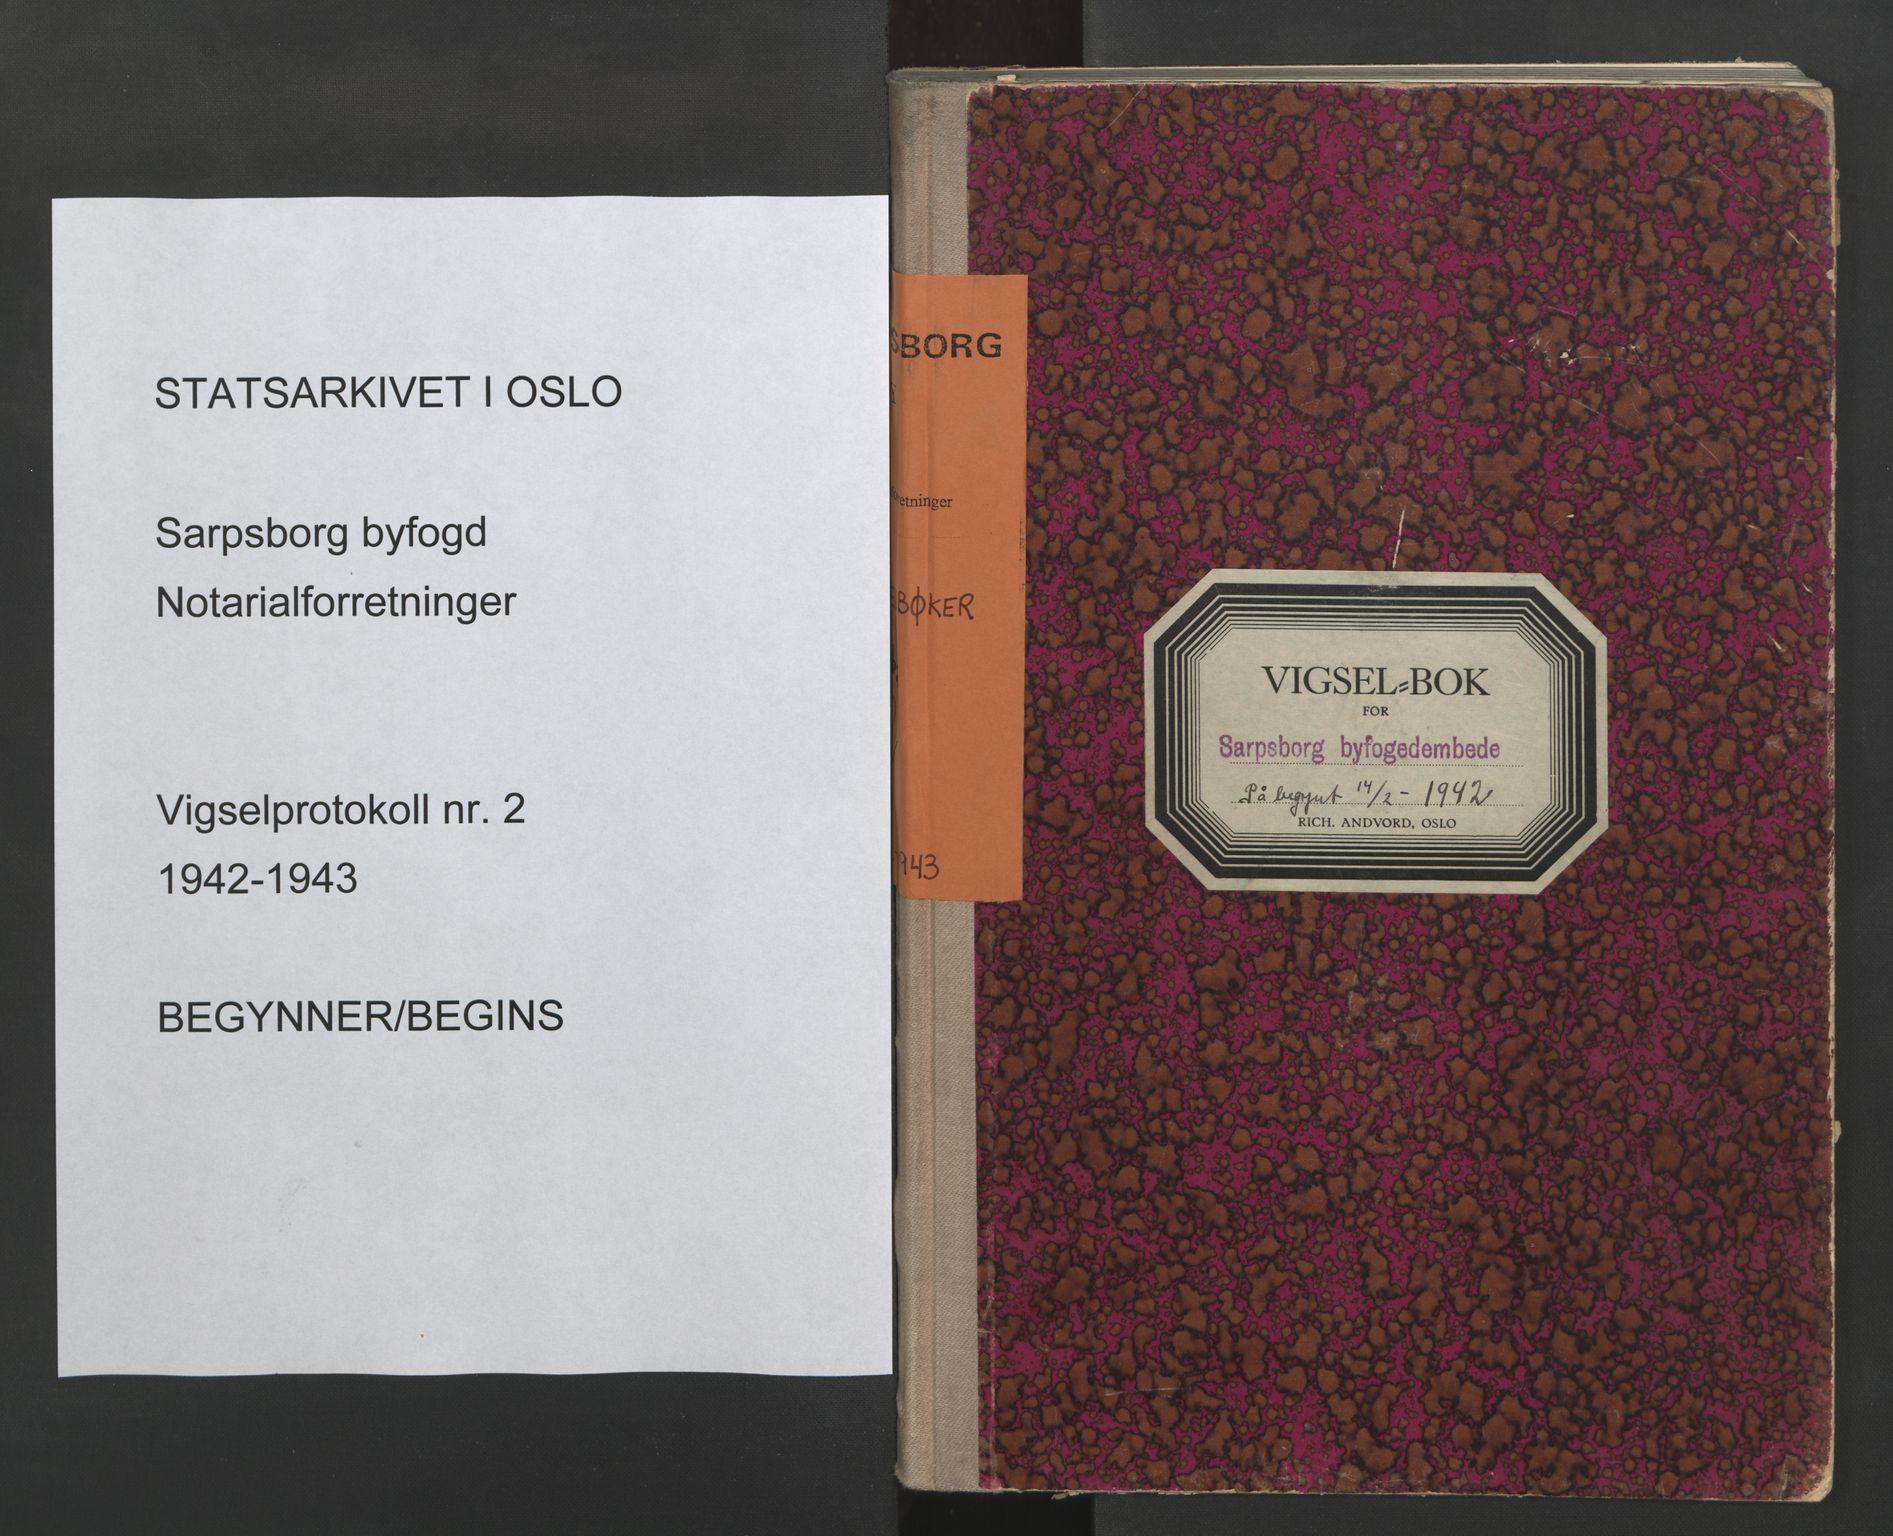 SAO, Sarpsborg byfogd, L/Lb/Lba/L0002: Vigselbok, 1942-1943, s. upaginert